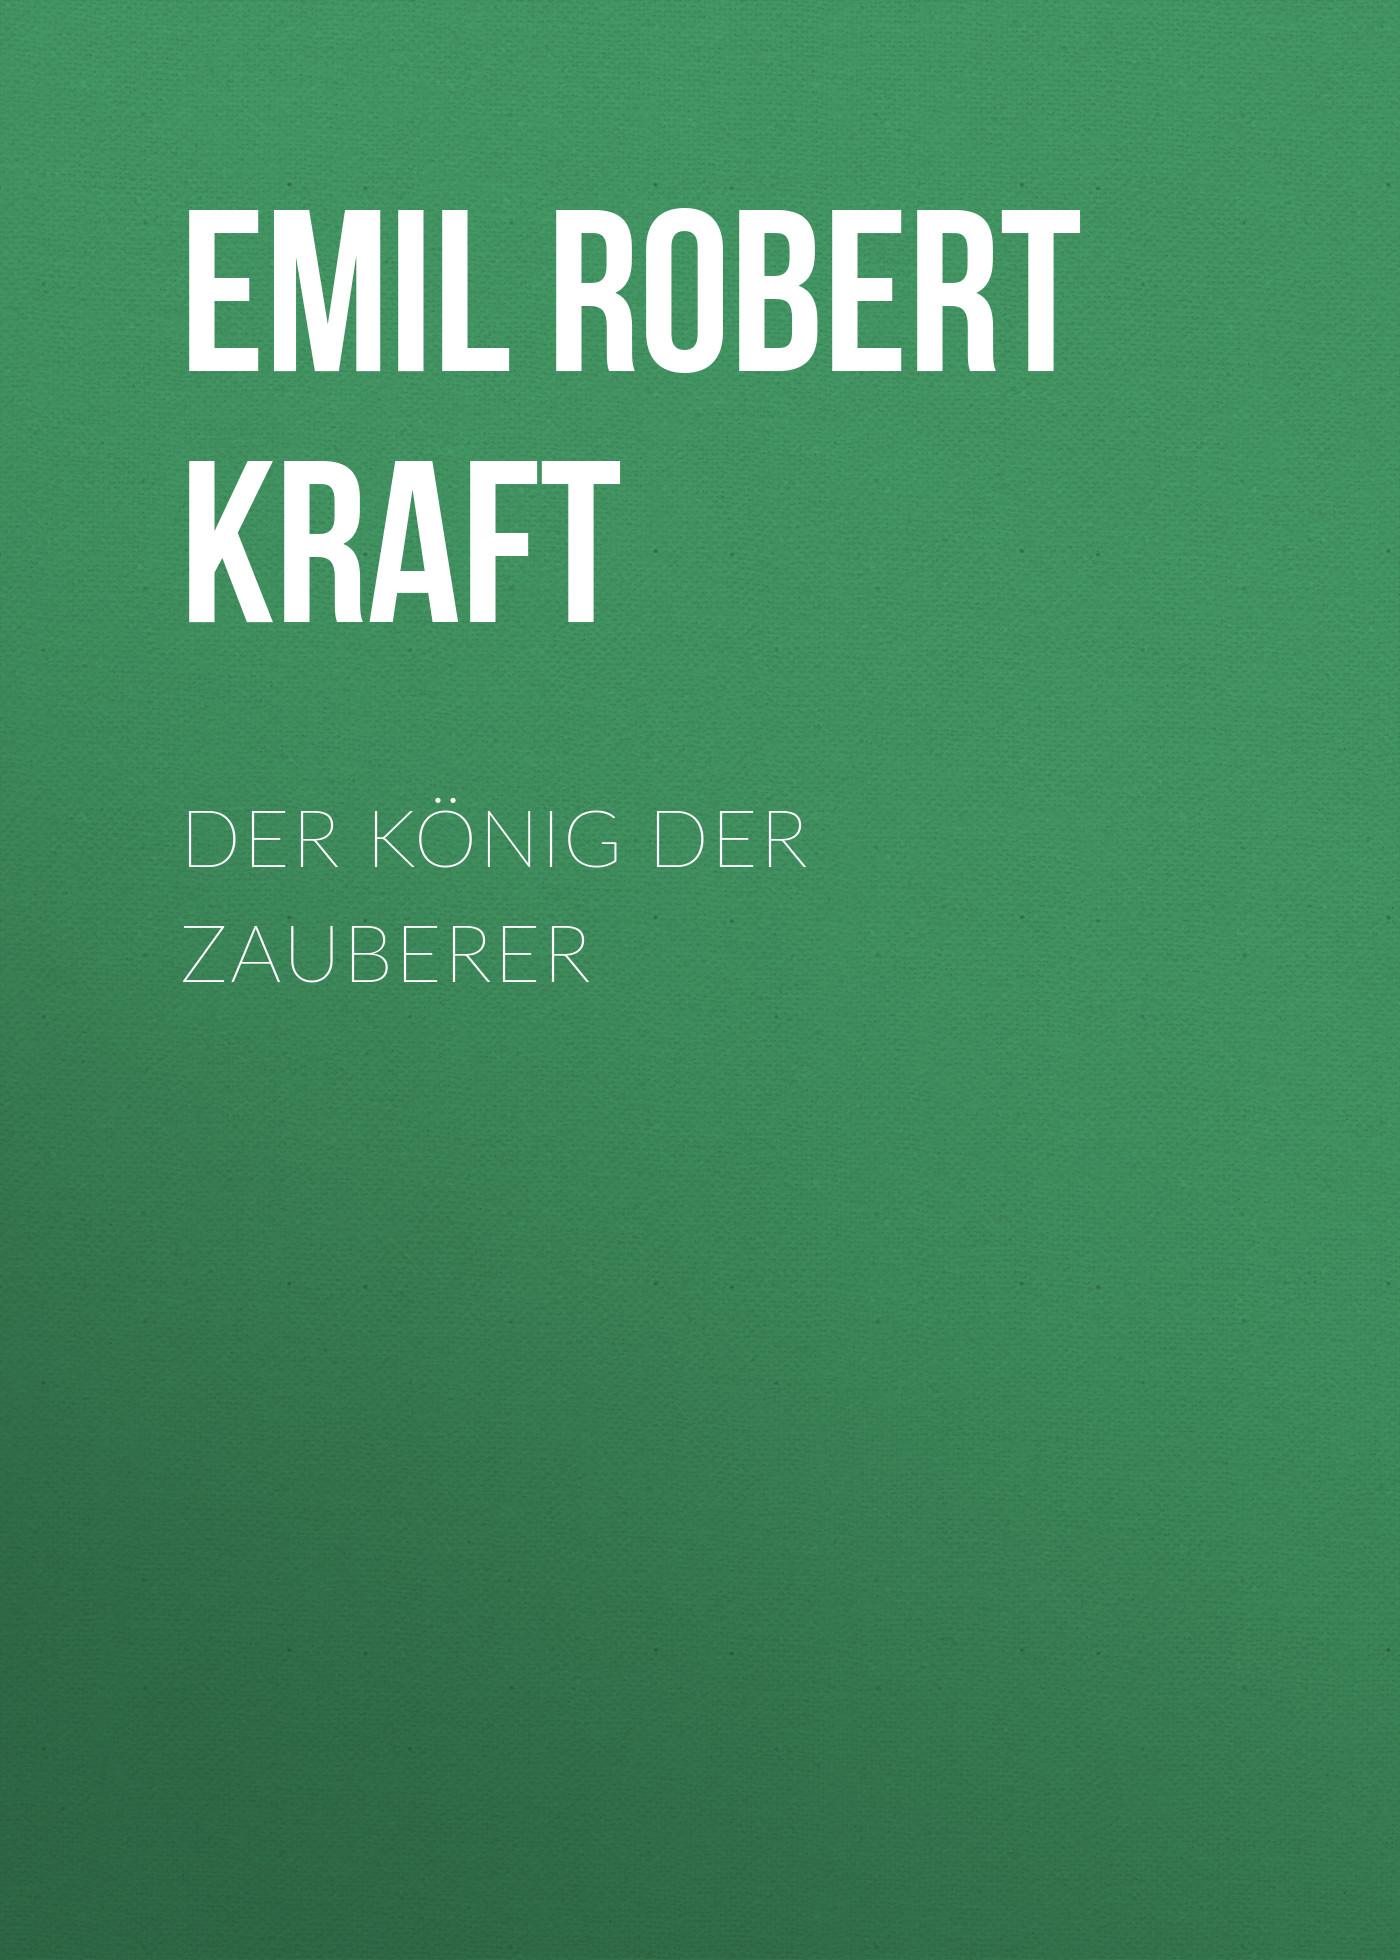 Emil Robert Kraft Der König der Zauberer robert emden gaskugeln anwendungen der mechanischen warmetheorie